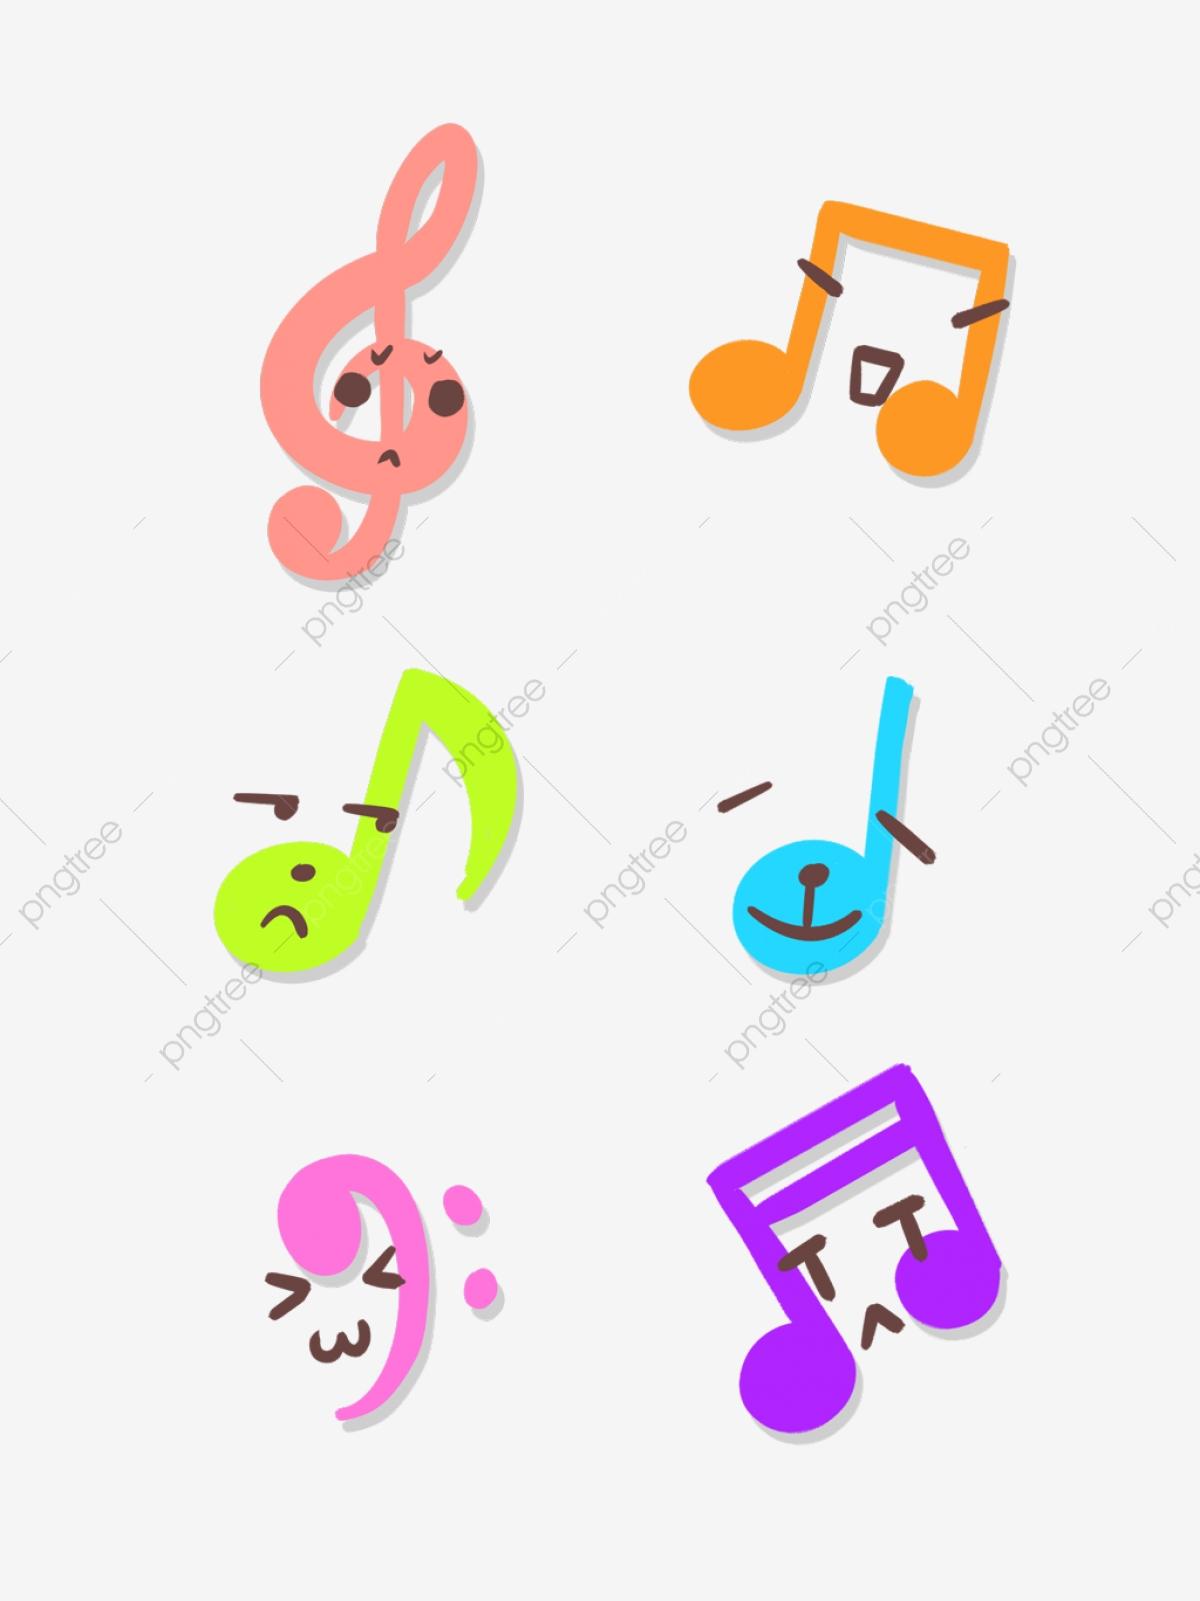 Hand Drawn Cartoon Cute Colorful Musical Notes Music Symbols.